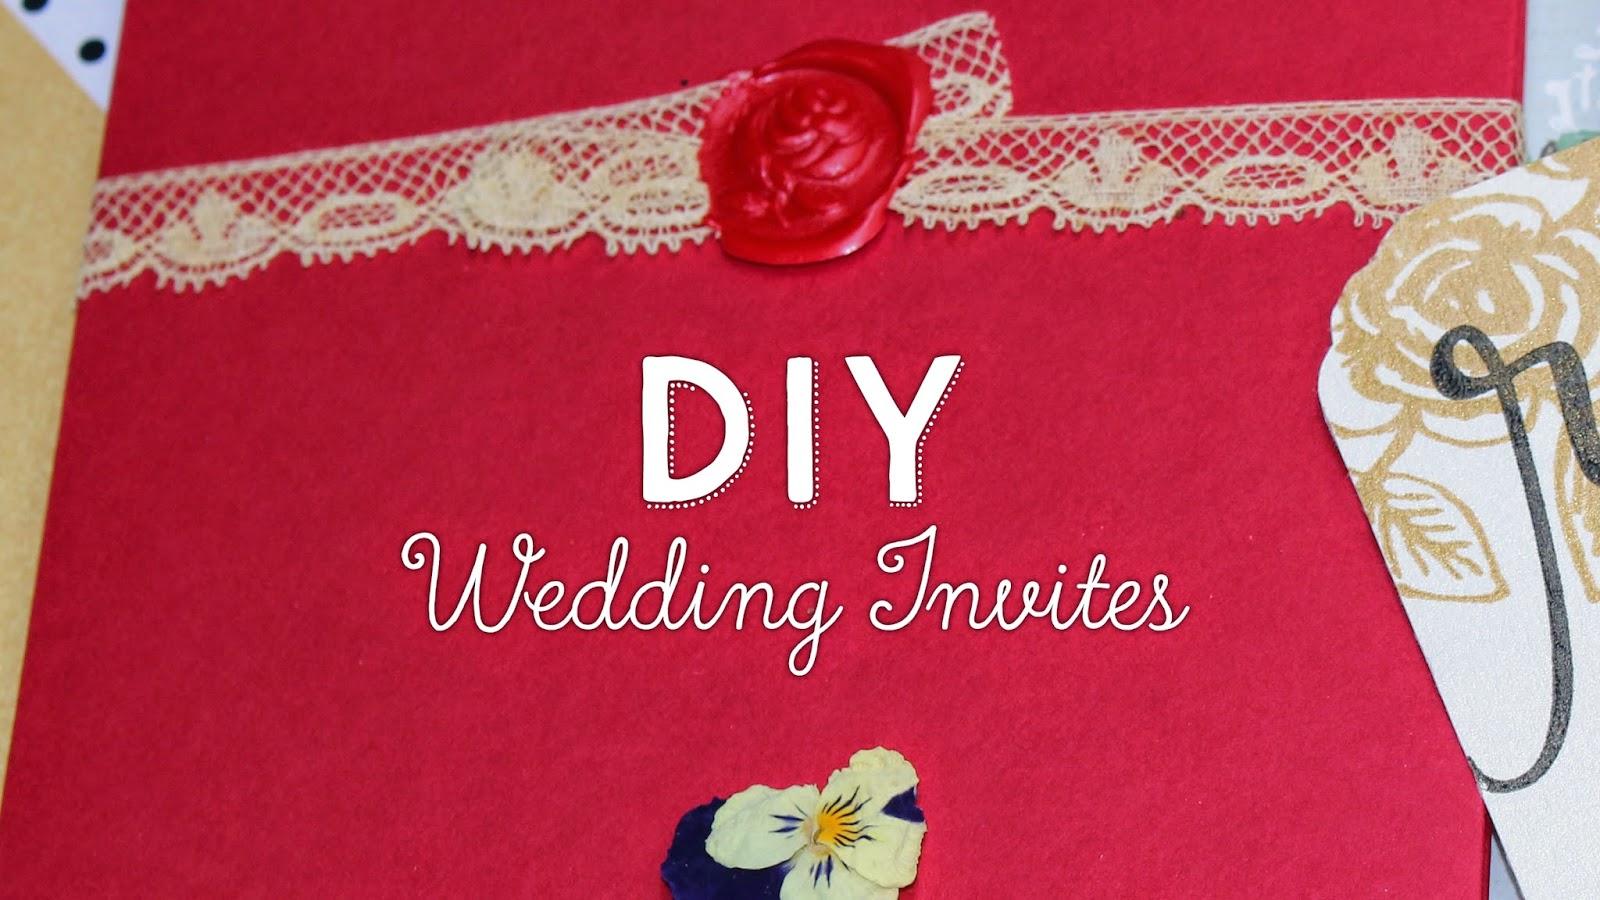 Dyi Wedding Invitations: Sophie Gallo Design Blog: DIY Wedding Invitations